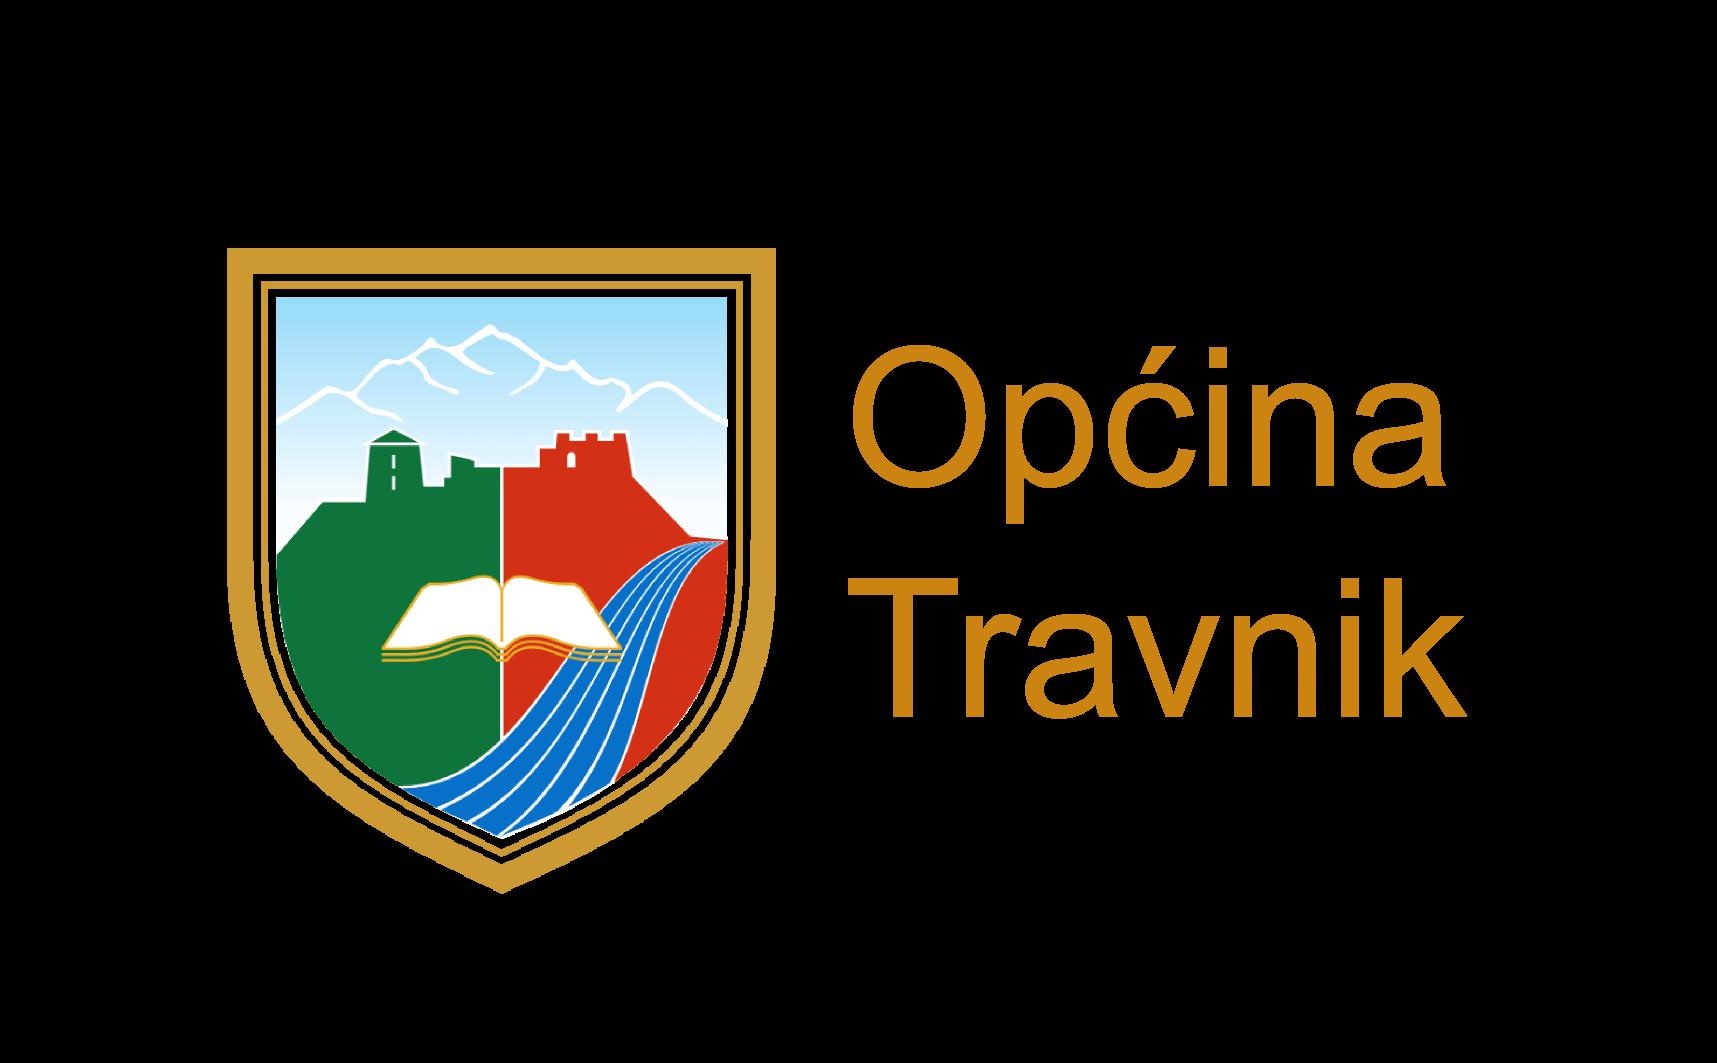 Opstina Travnik